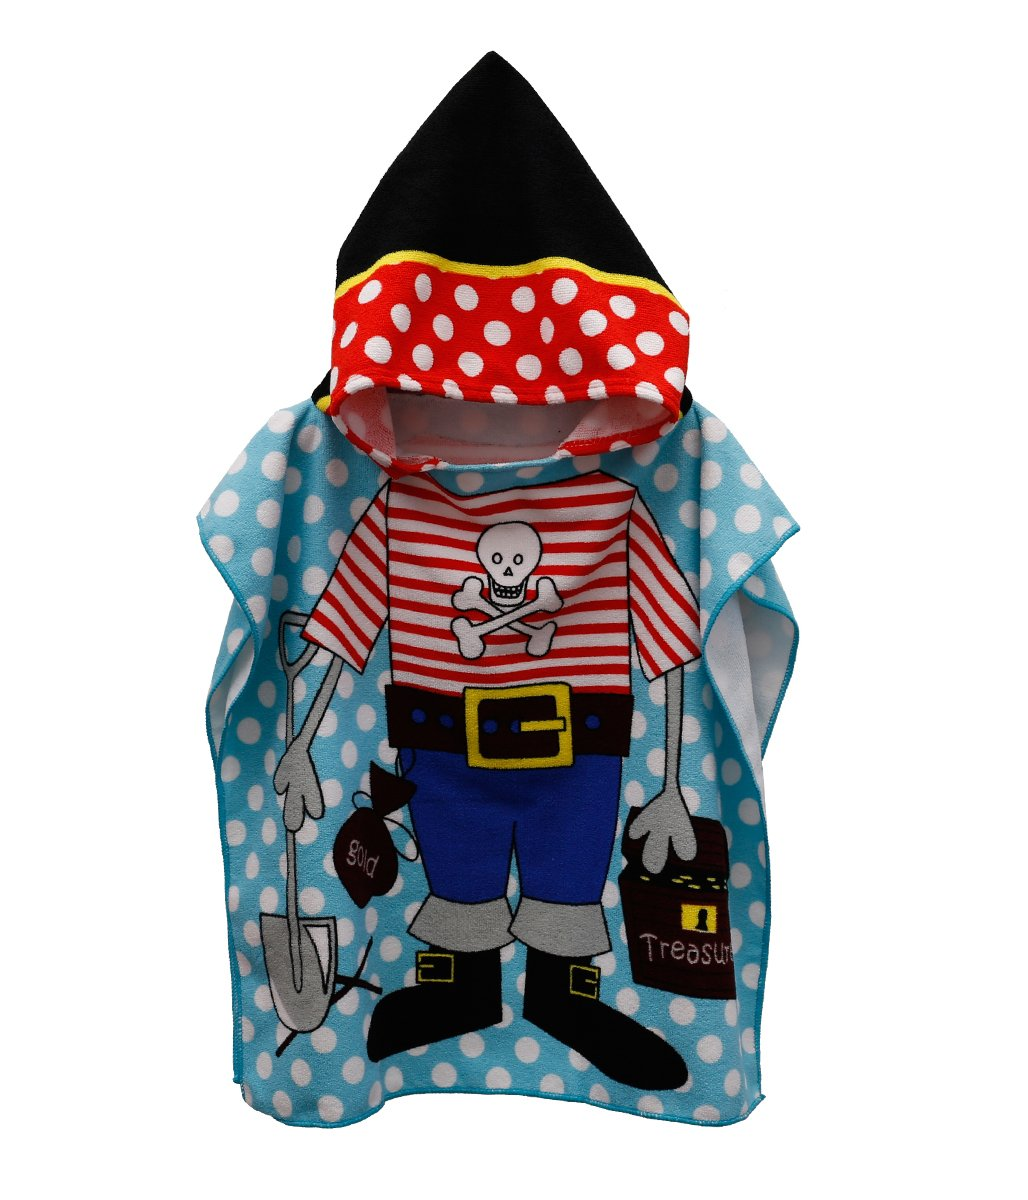 Enjoy Holiday Toddler Hooded Beach Bath Towel – Soft Swim Pool Coverup Poncho Pirate Cape for Kids Boys Children, 5 Year Old Bath Robe